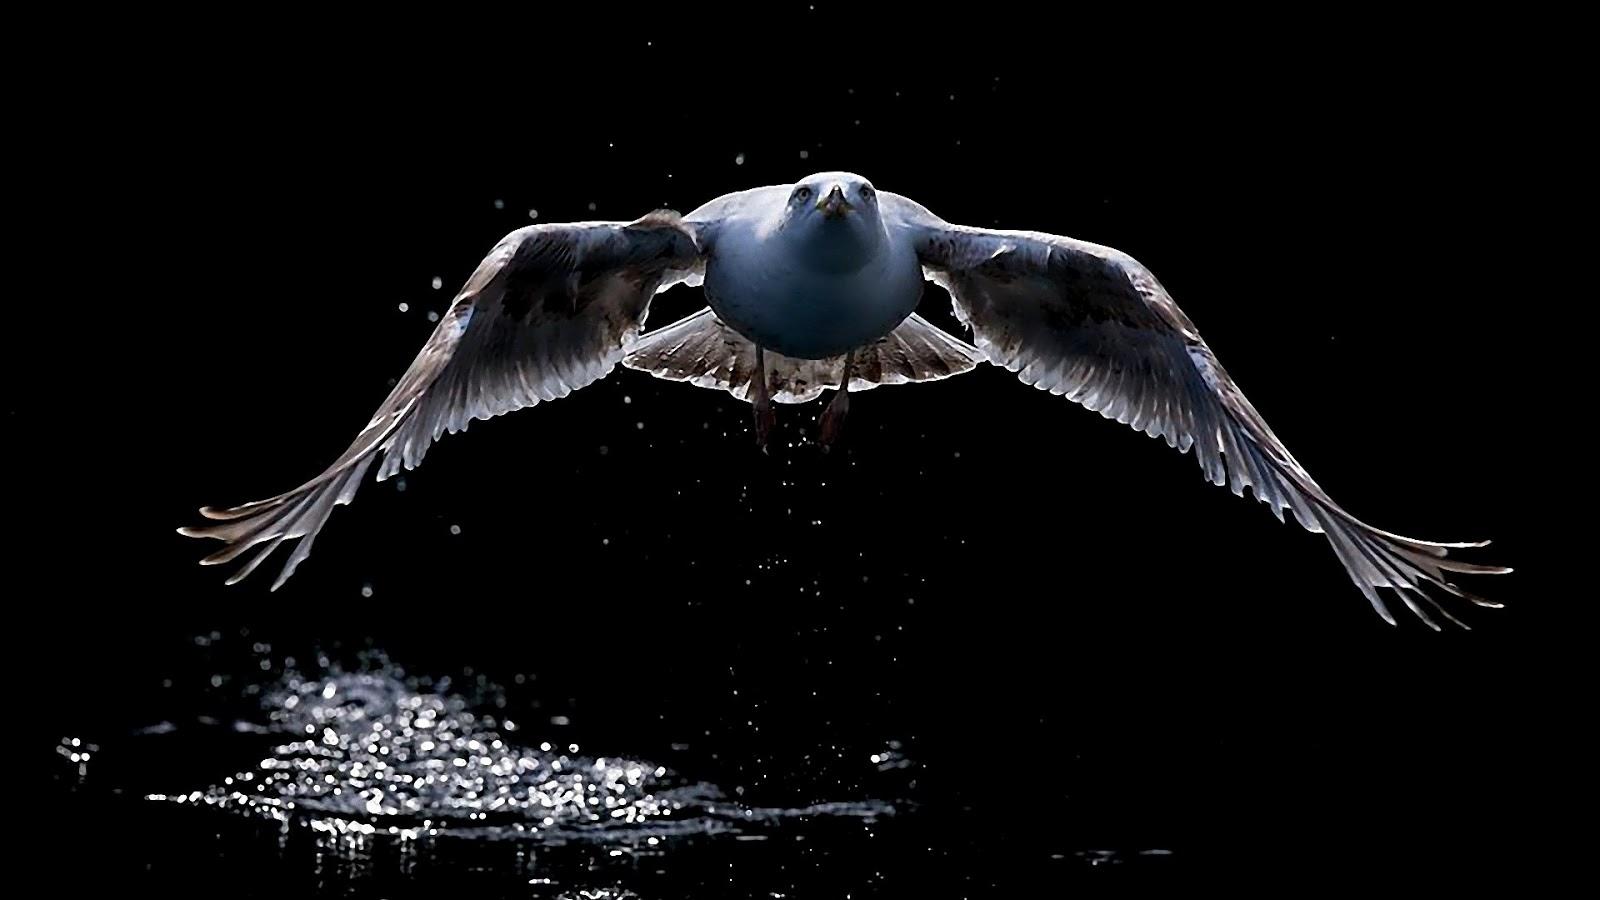 Birds hd wallpapers wallpaper202 - Animal black background wallpaper ...